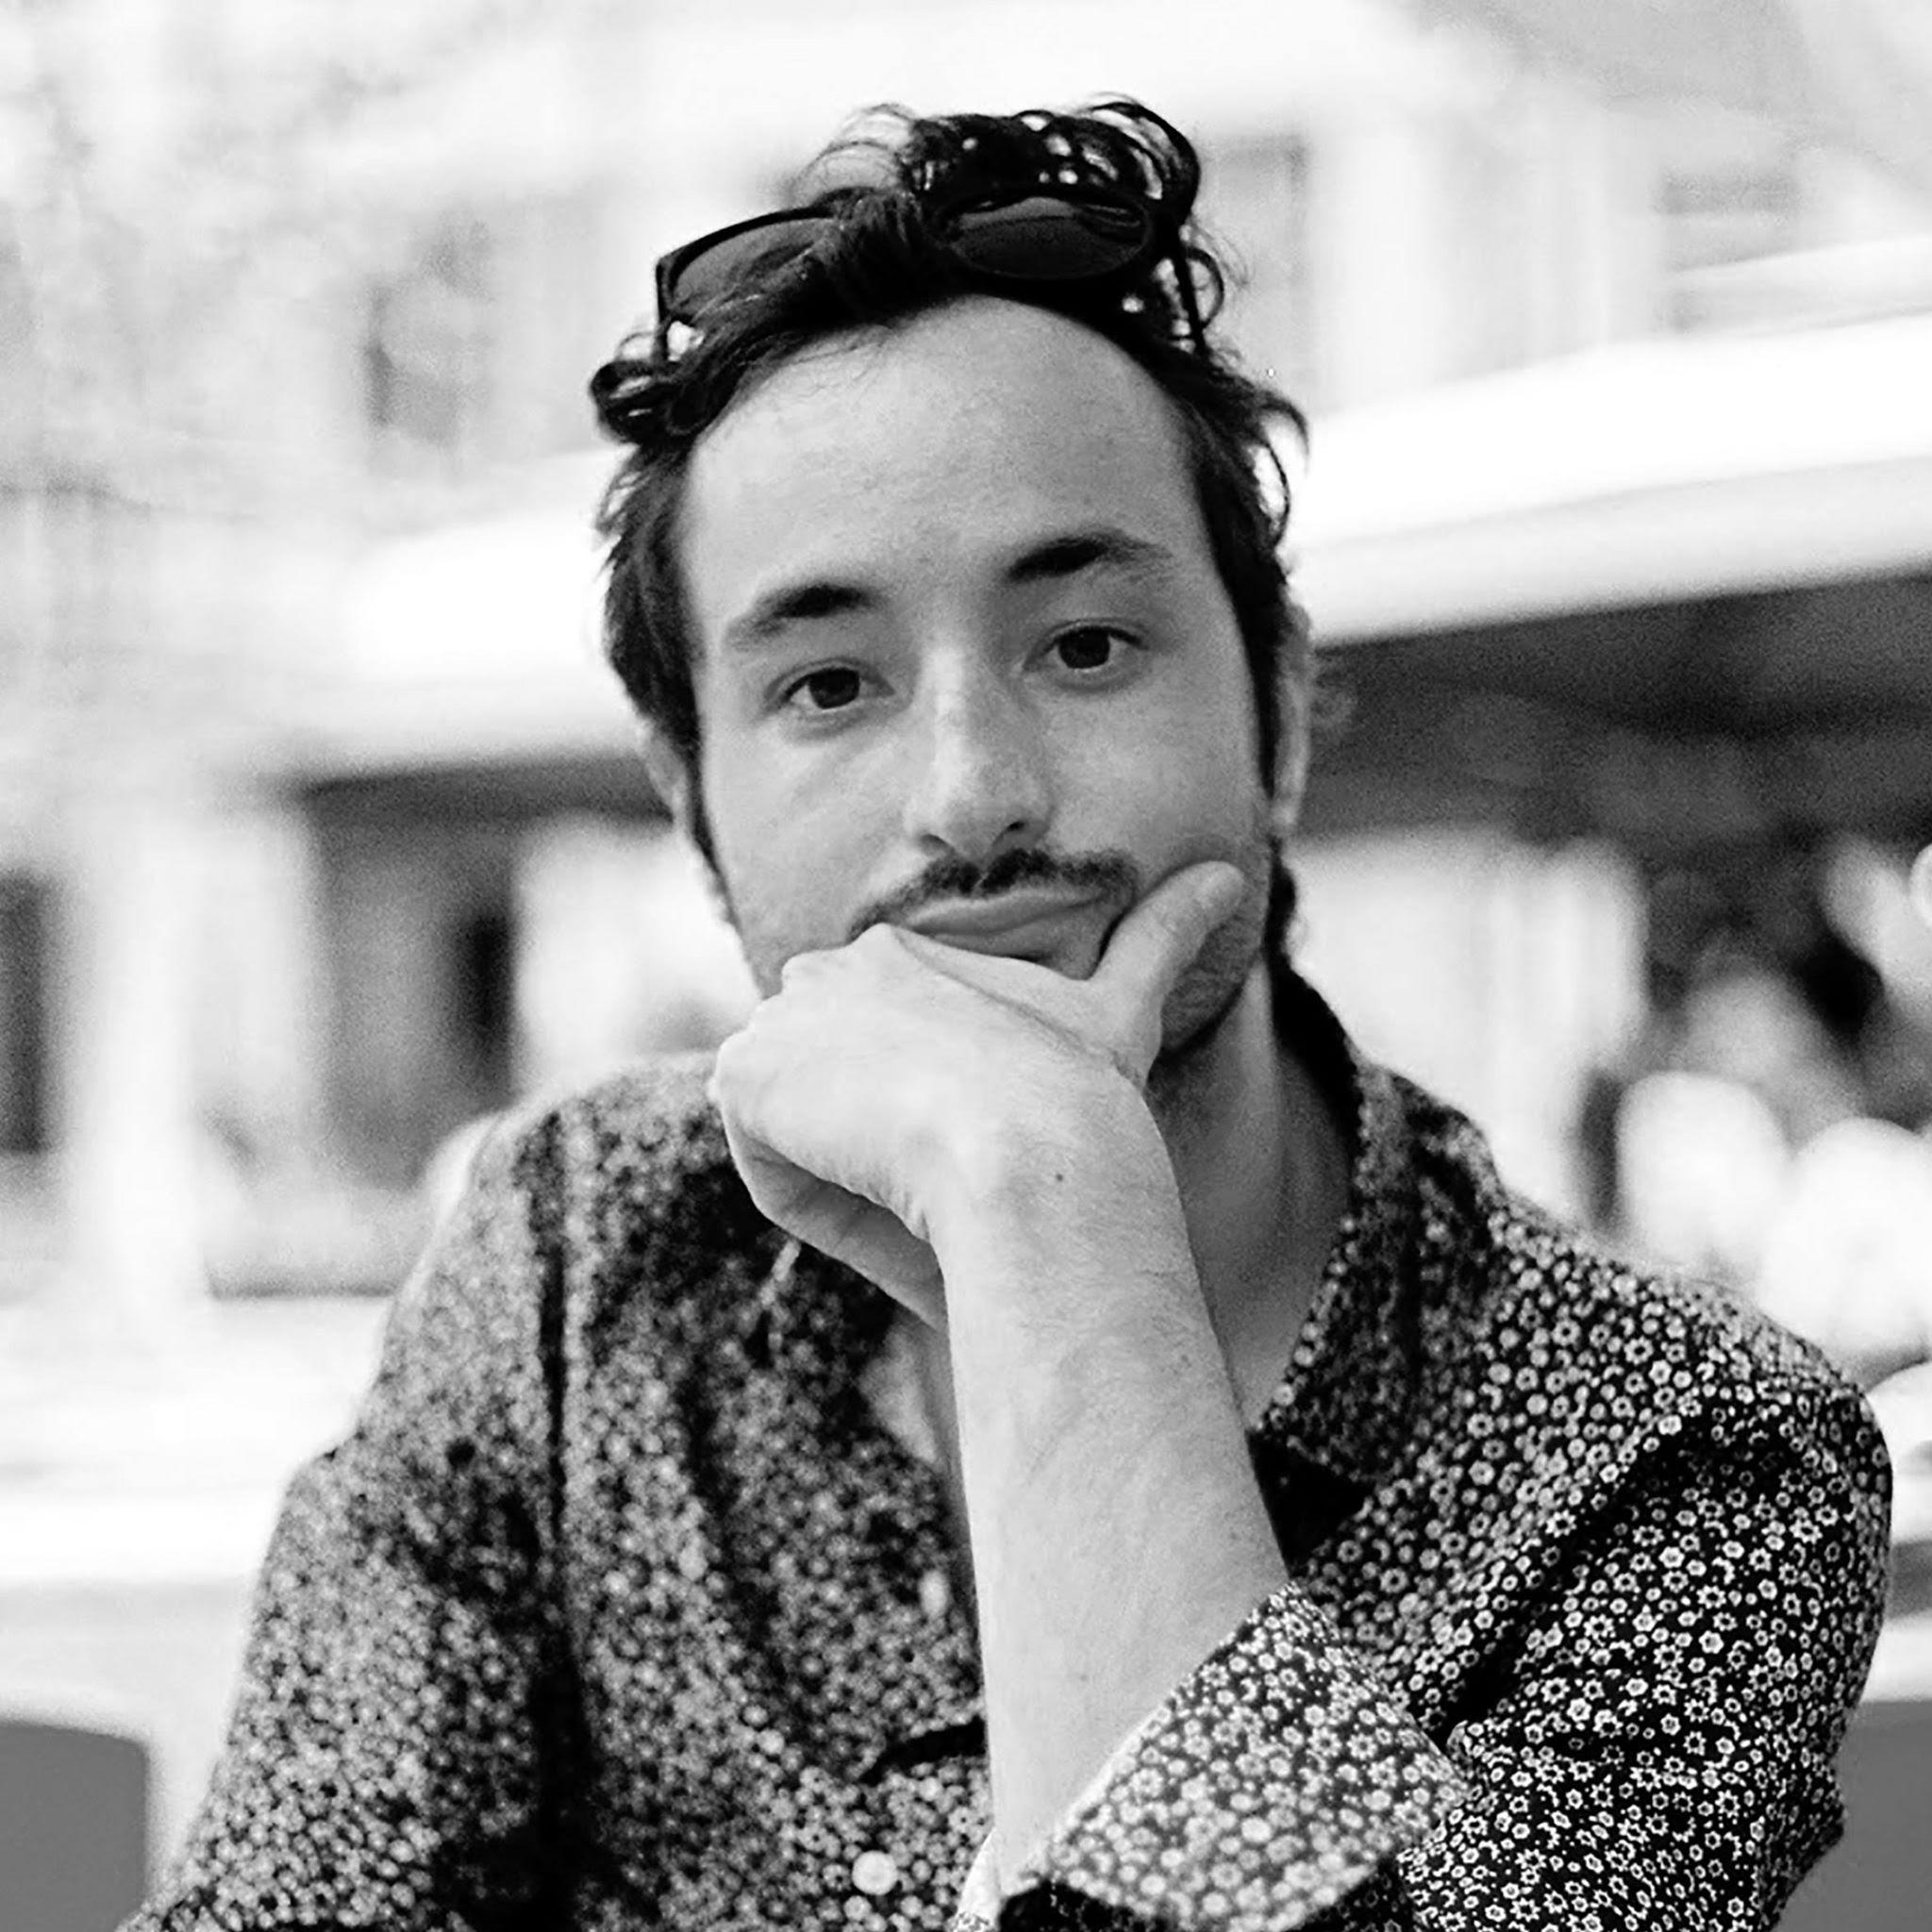 Raphaël Colombani - Tribal art 专家 - Raphaël现在居住在法国。他早先学习摄影,曾服务于多家新闻机构,后专注于艺术历史,并在2015年取得了位于法国巴黎的Ecole du Louvre的学位证书专门研究民族志和前哥伦比亚艺术。他服务于法国艺术市场数十年,作为一名艺术类专家,曾出任过多家知名画廊的藏品经理。作为Alyes Auctions 的一员,他协助我们创建非洲,大洋洲和美国地区的艺术部门。